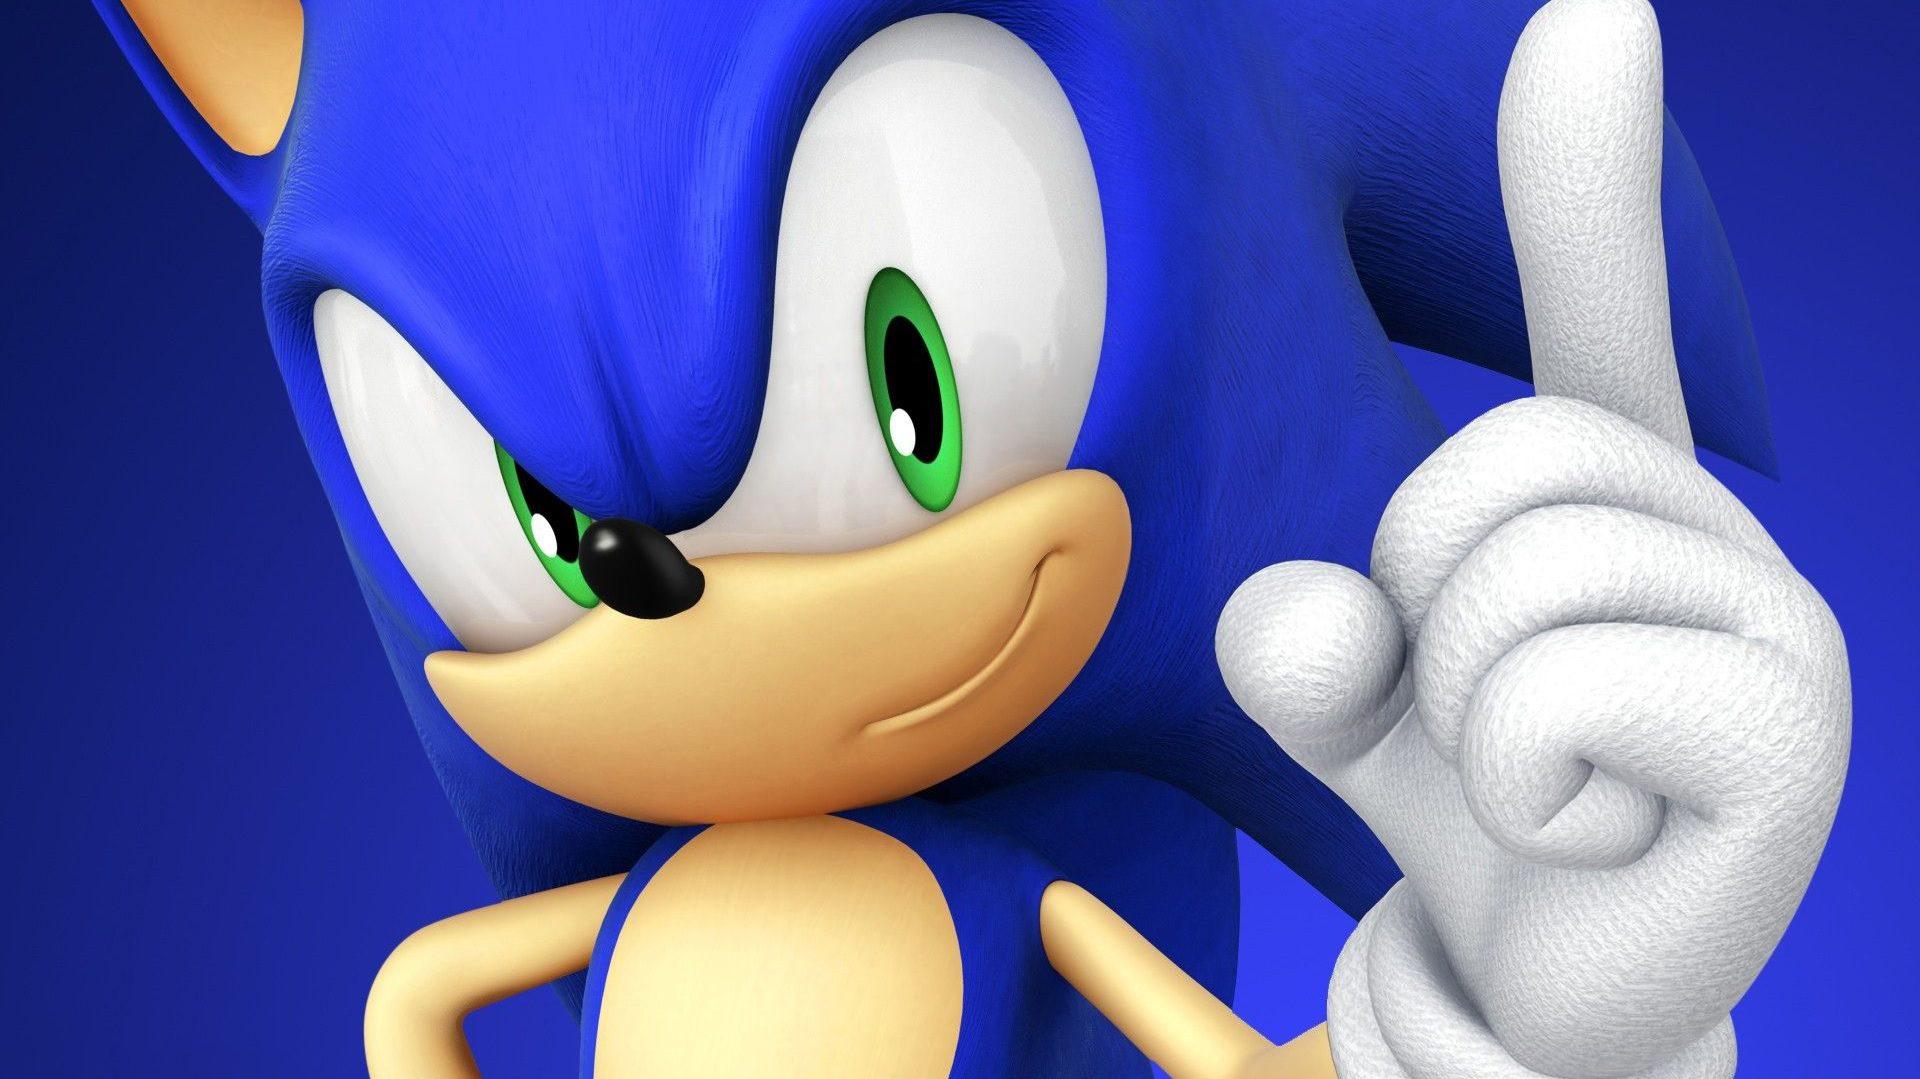 O Sonic Robo Blast 2 versão 2.2 já está disponível para download